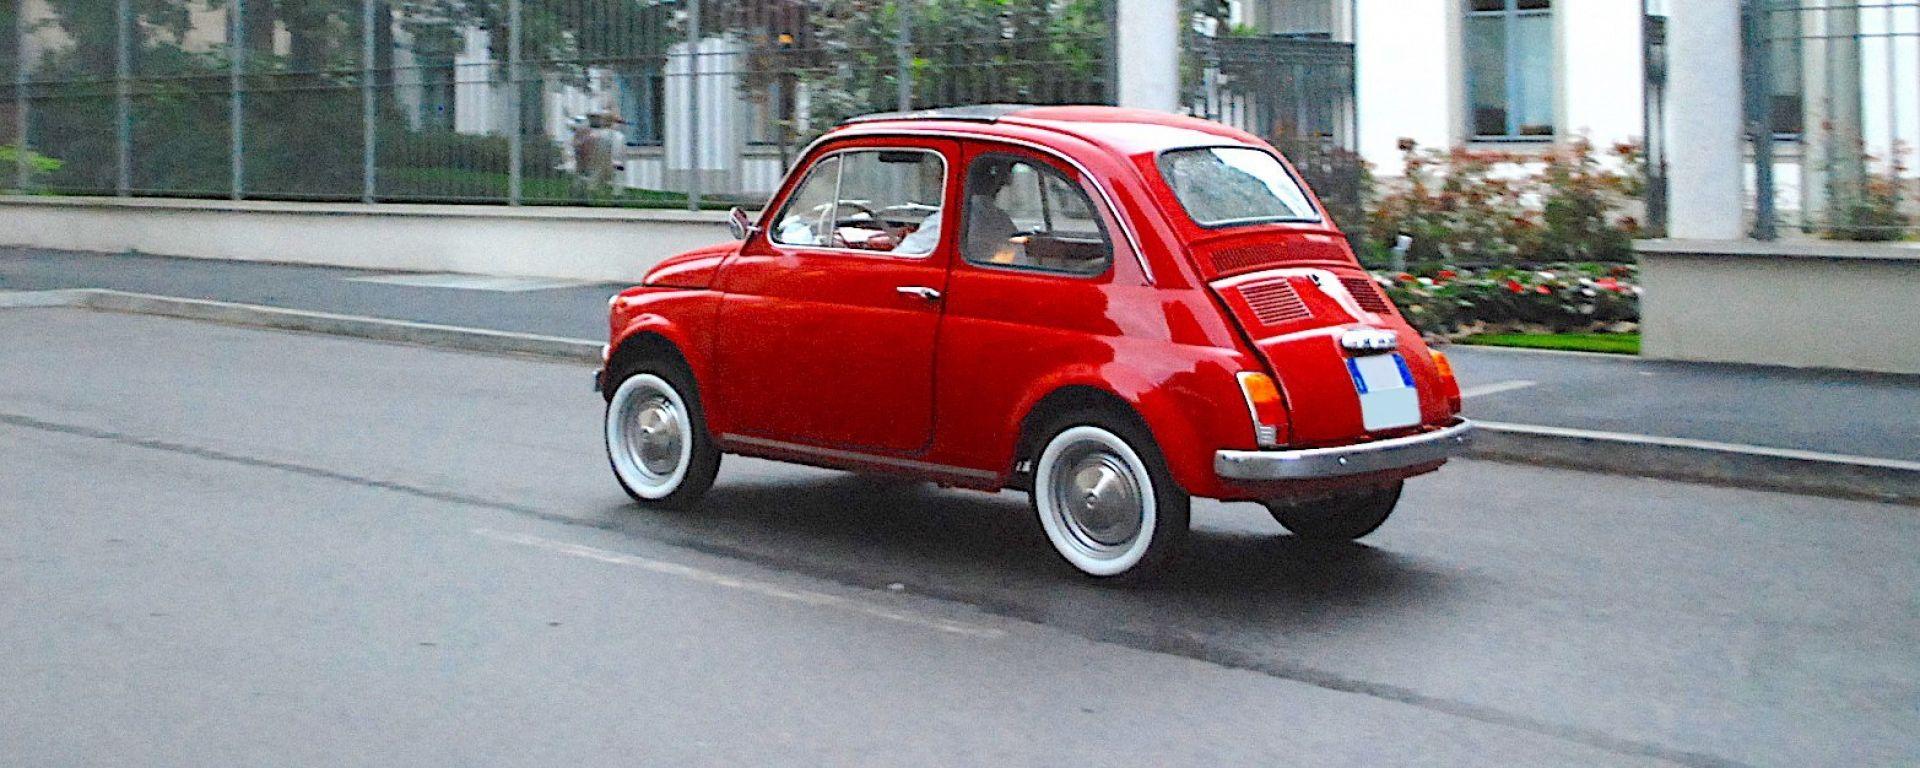 Fiat 500 elettrica by Officine Ruggenti: vista 3/4 posteriore